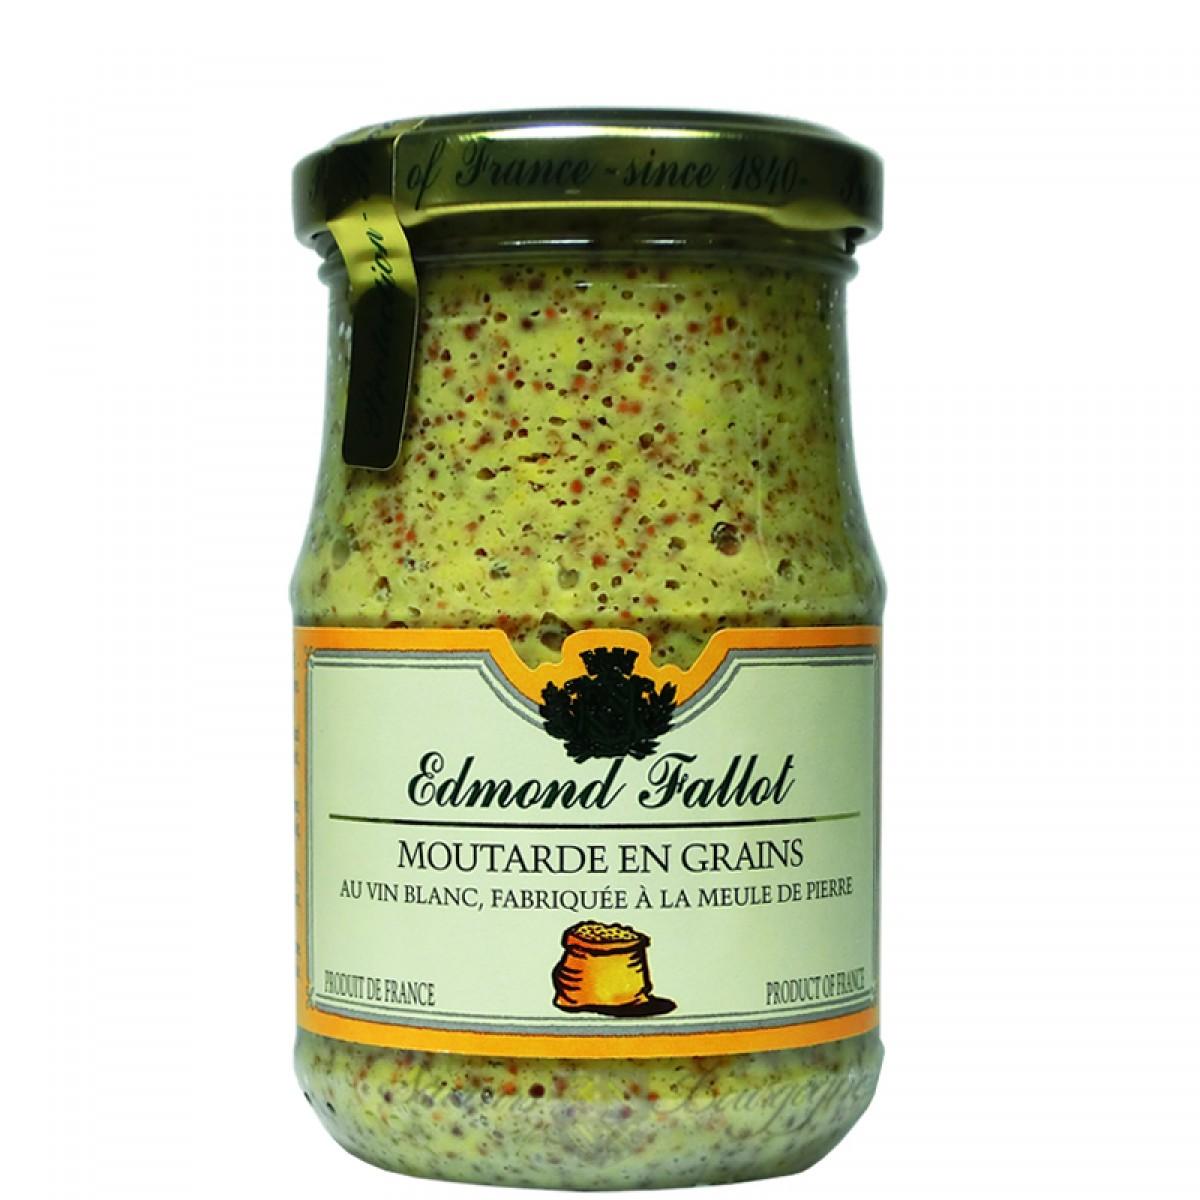 Moutarde en grains au vin blanc de dijon 210g fallot saveurs de bourgogne - Moutarde fallot vente ...